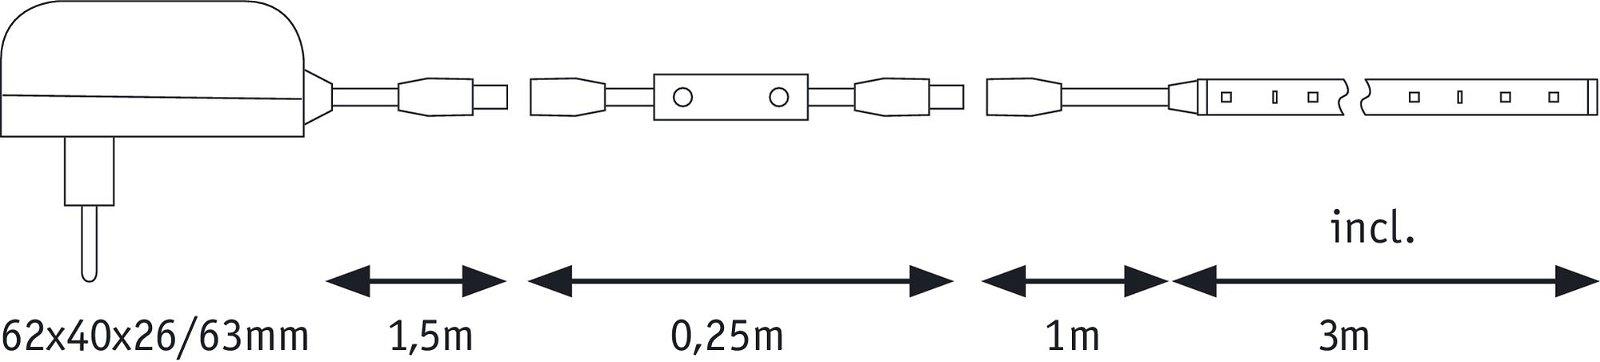 FlexLED LED Strip 3D 3m 8,0W 960lm 3000K 12VA